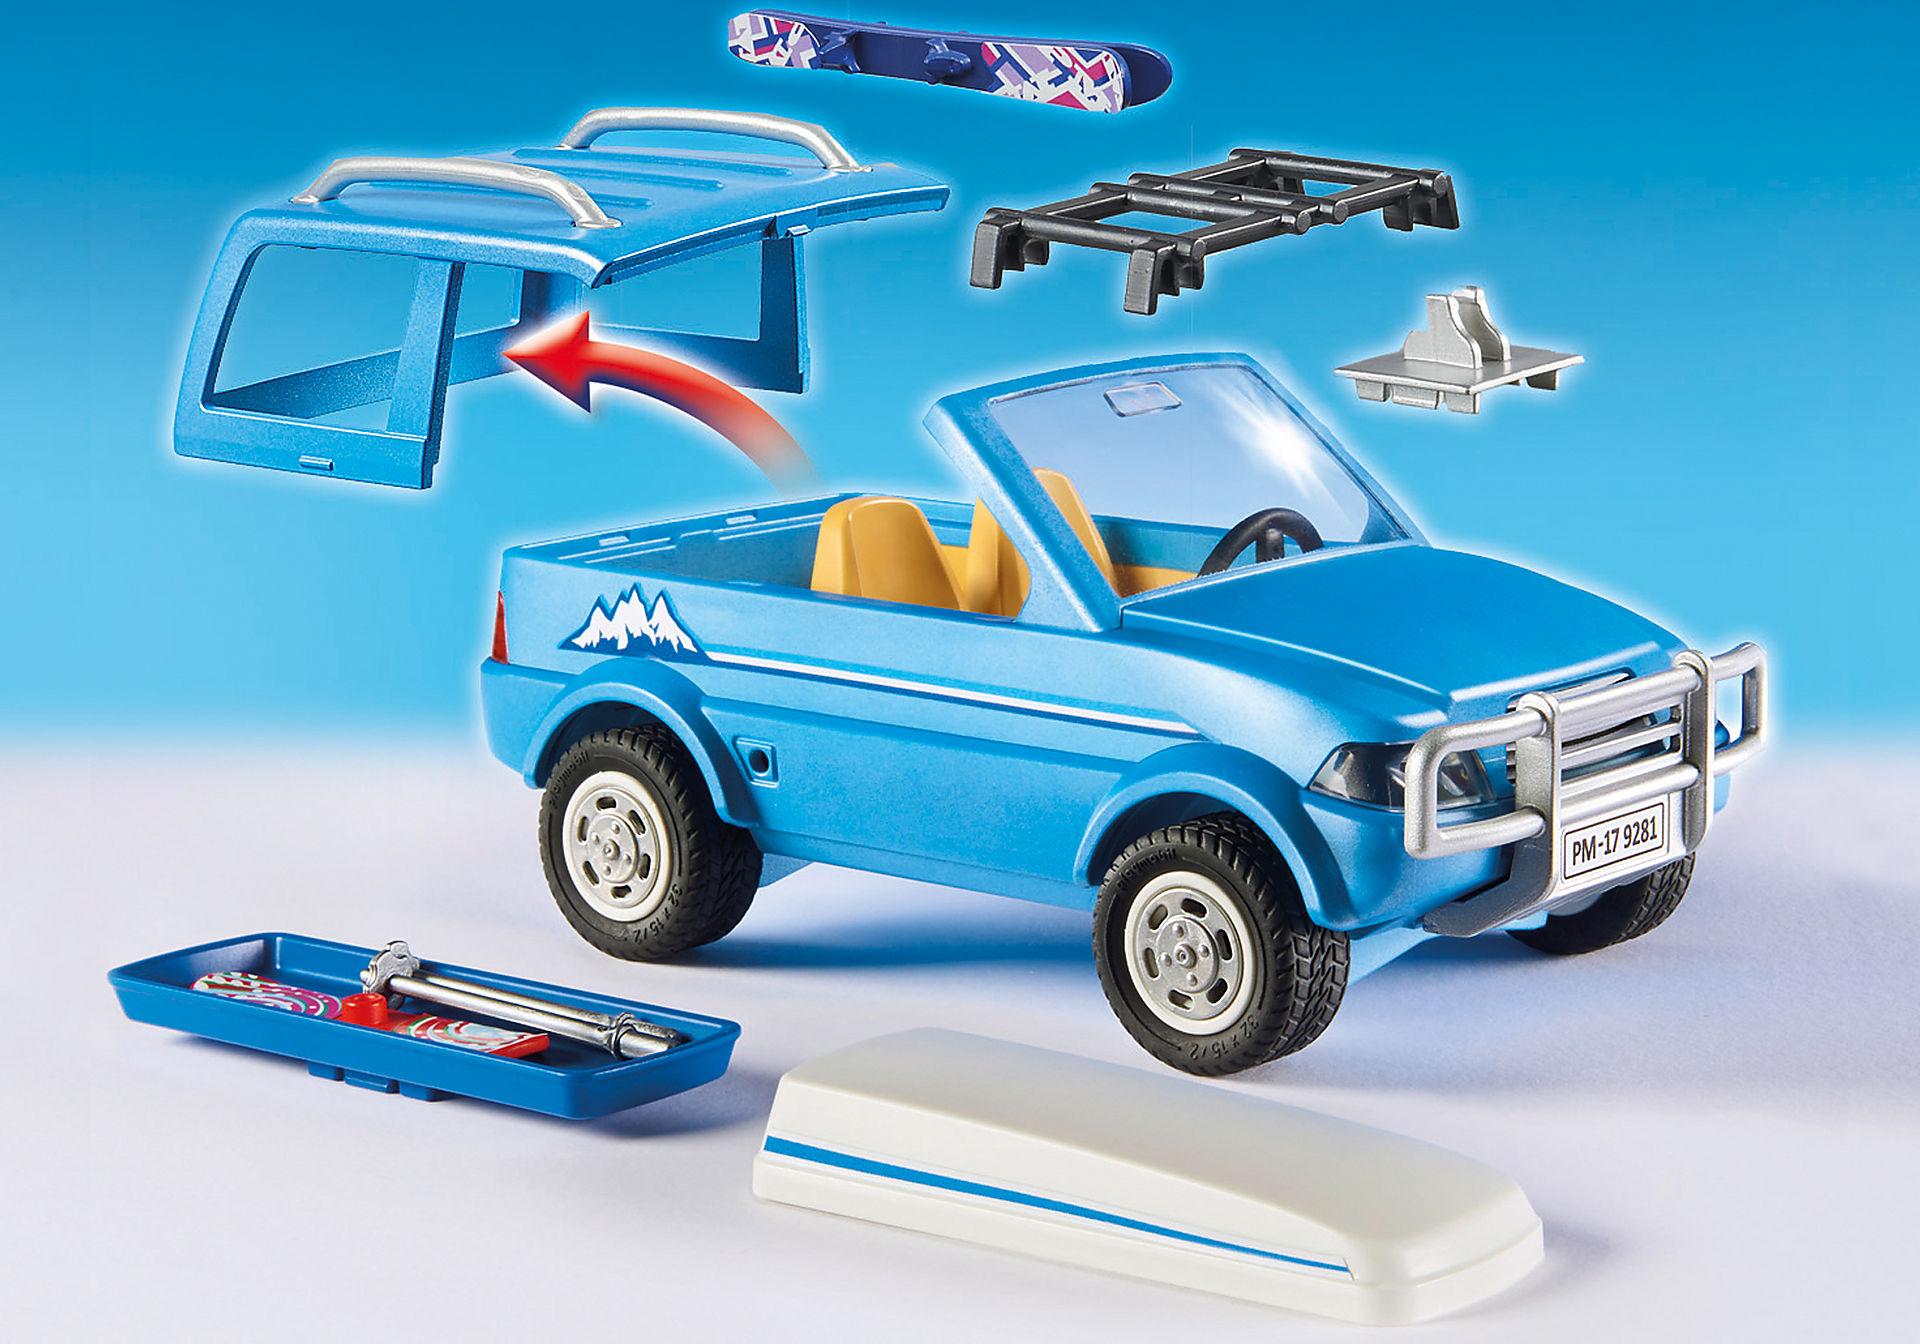 9281 Auto mit Dachbox zoom image7